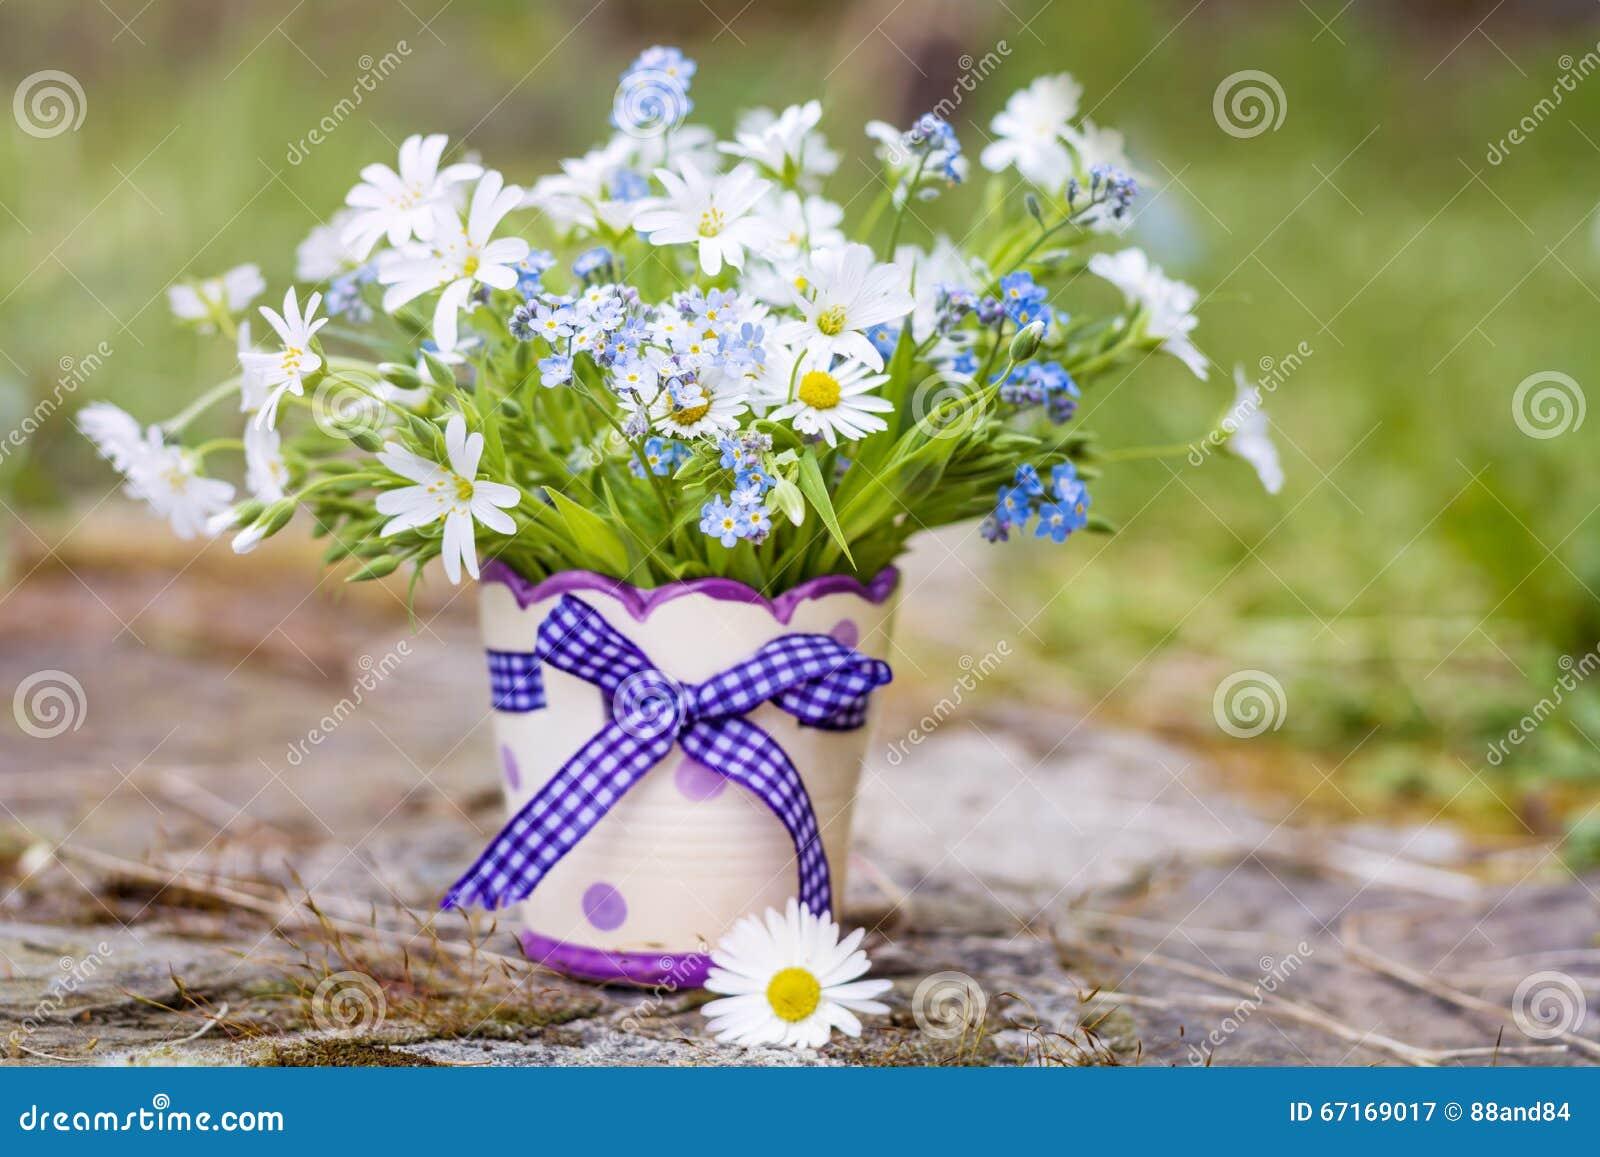 Beautiful daisy flowers in small decorative vase stock image image royalty free stock photo download beautiful daisy flowers in small decorative vase stock image izmirmasajfo